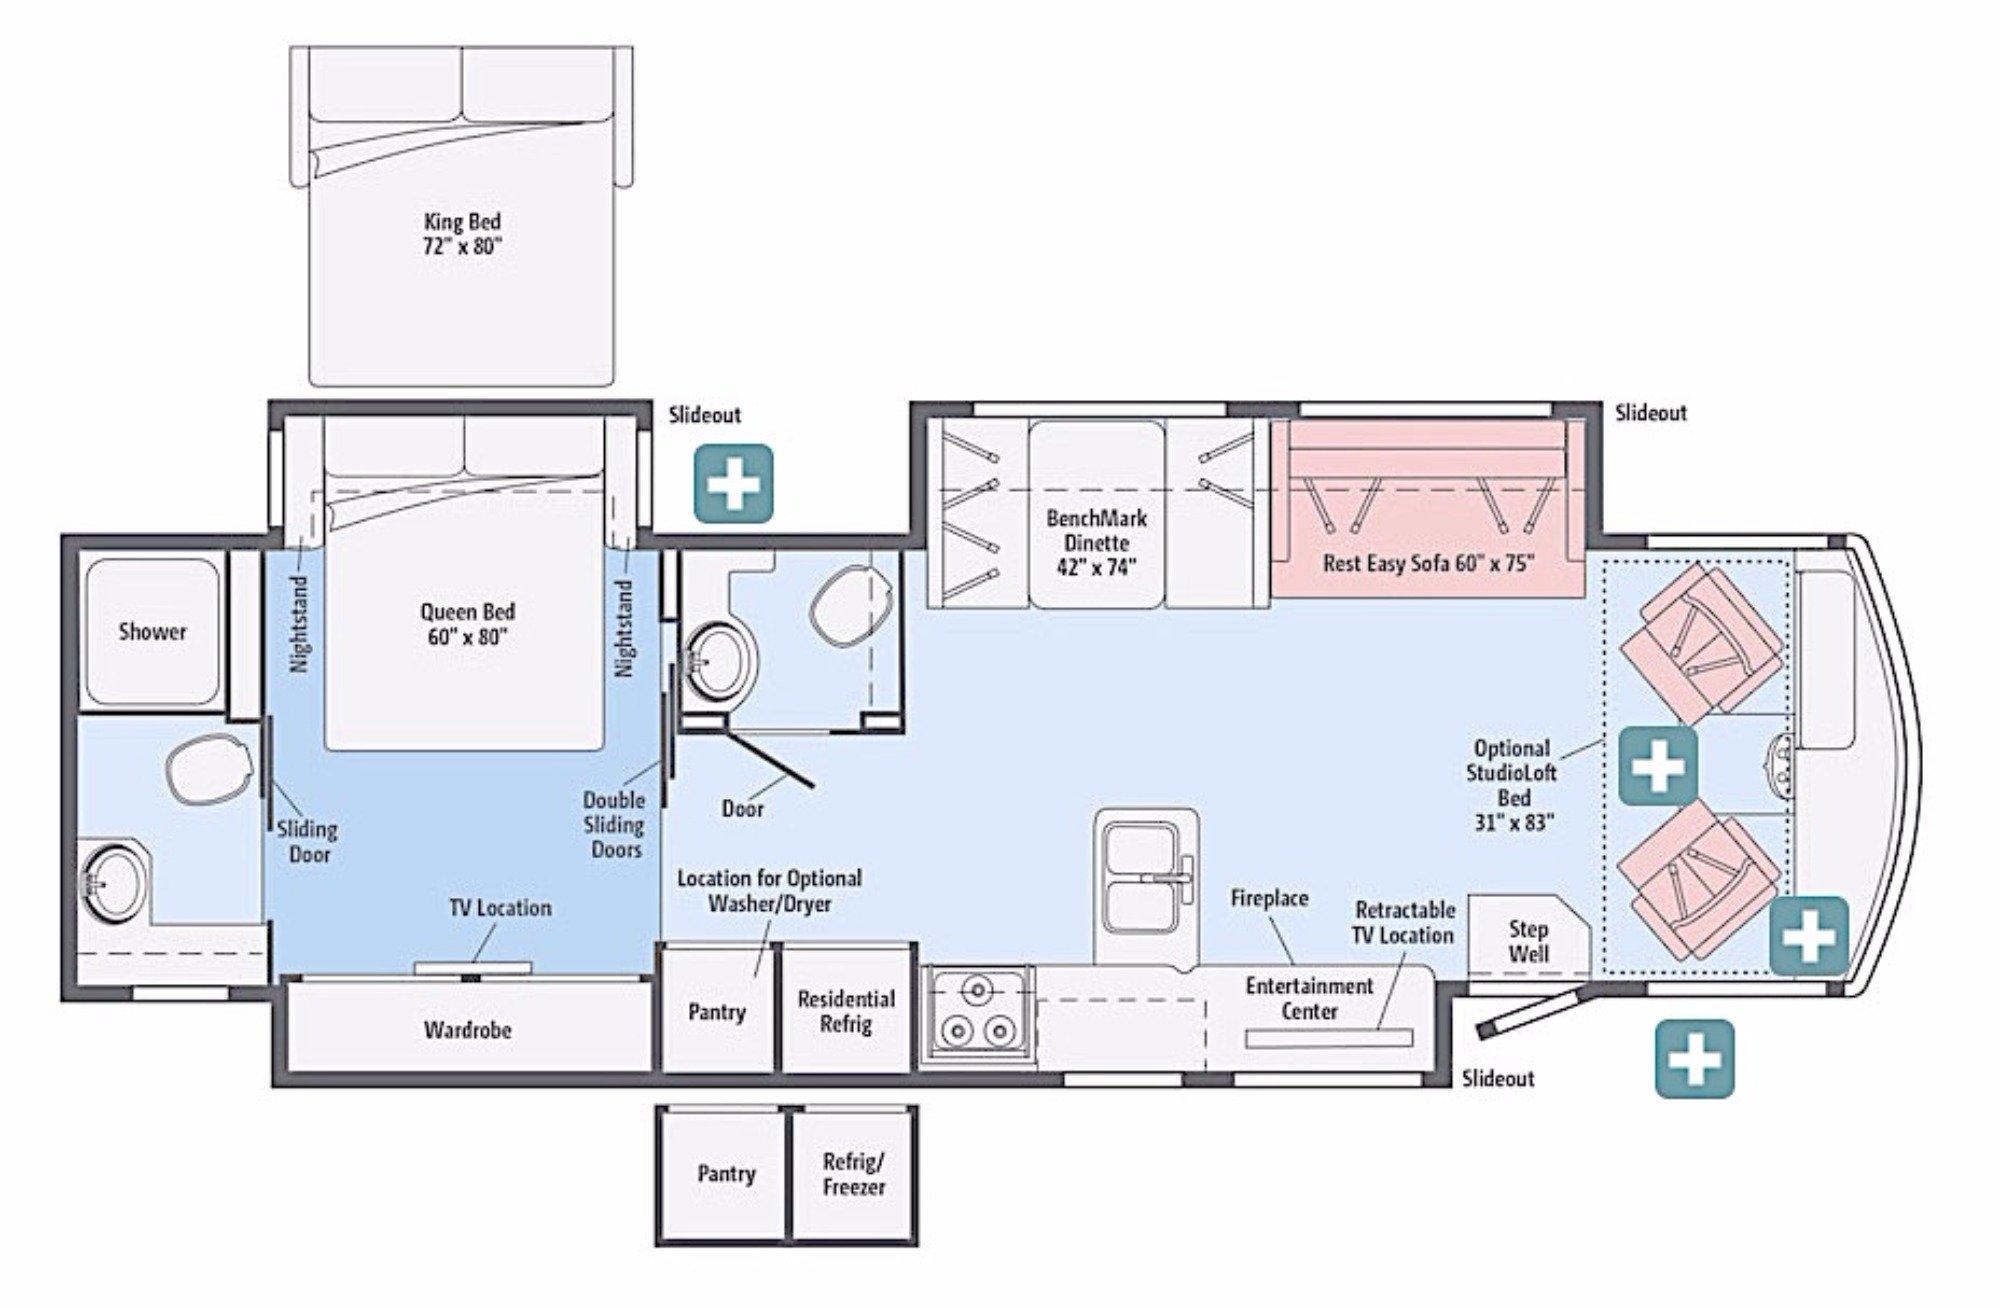 View Floor Plan for 2017 WINNEBAGO SIGHTSEER 36Z